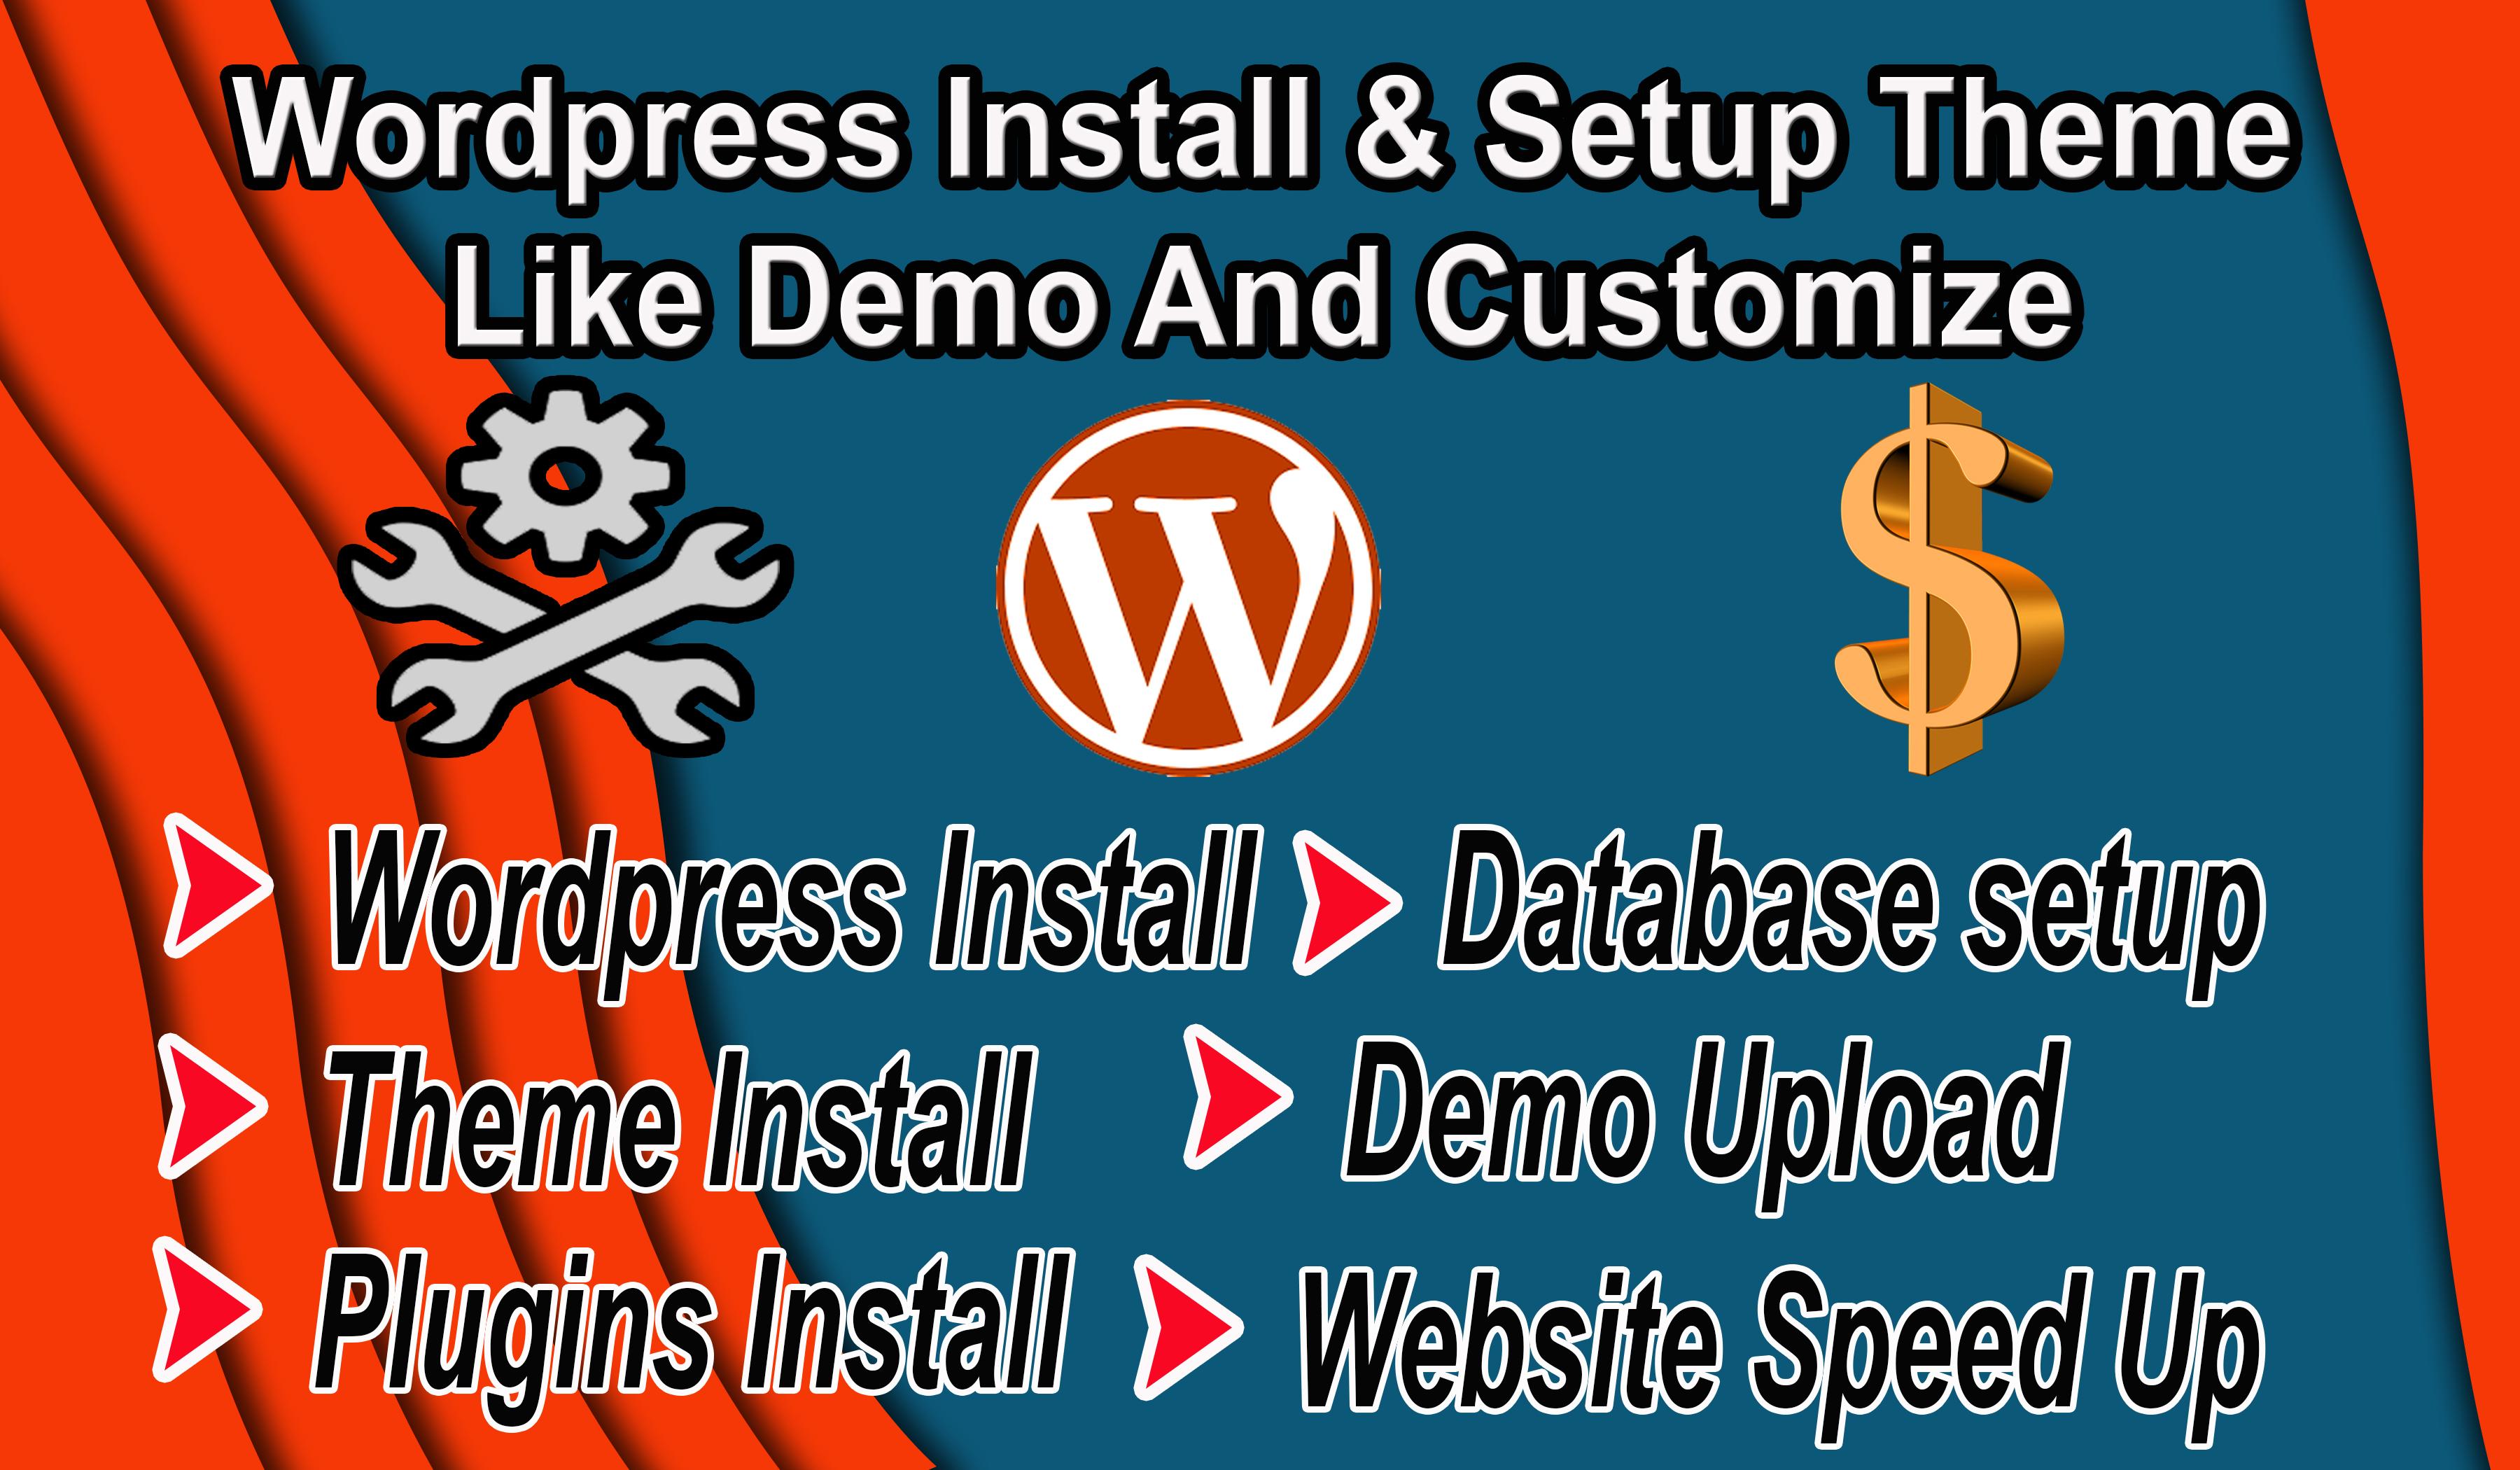 I will install WordPress,  theme setup,  demo Upload,  Speed Up And Do customization